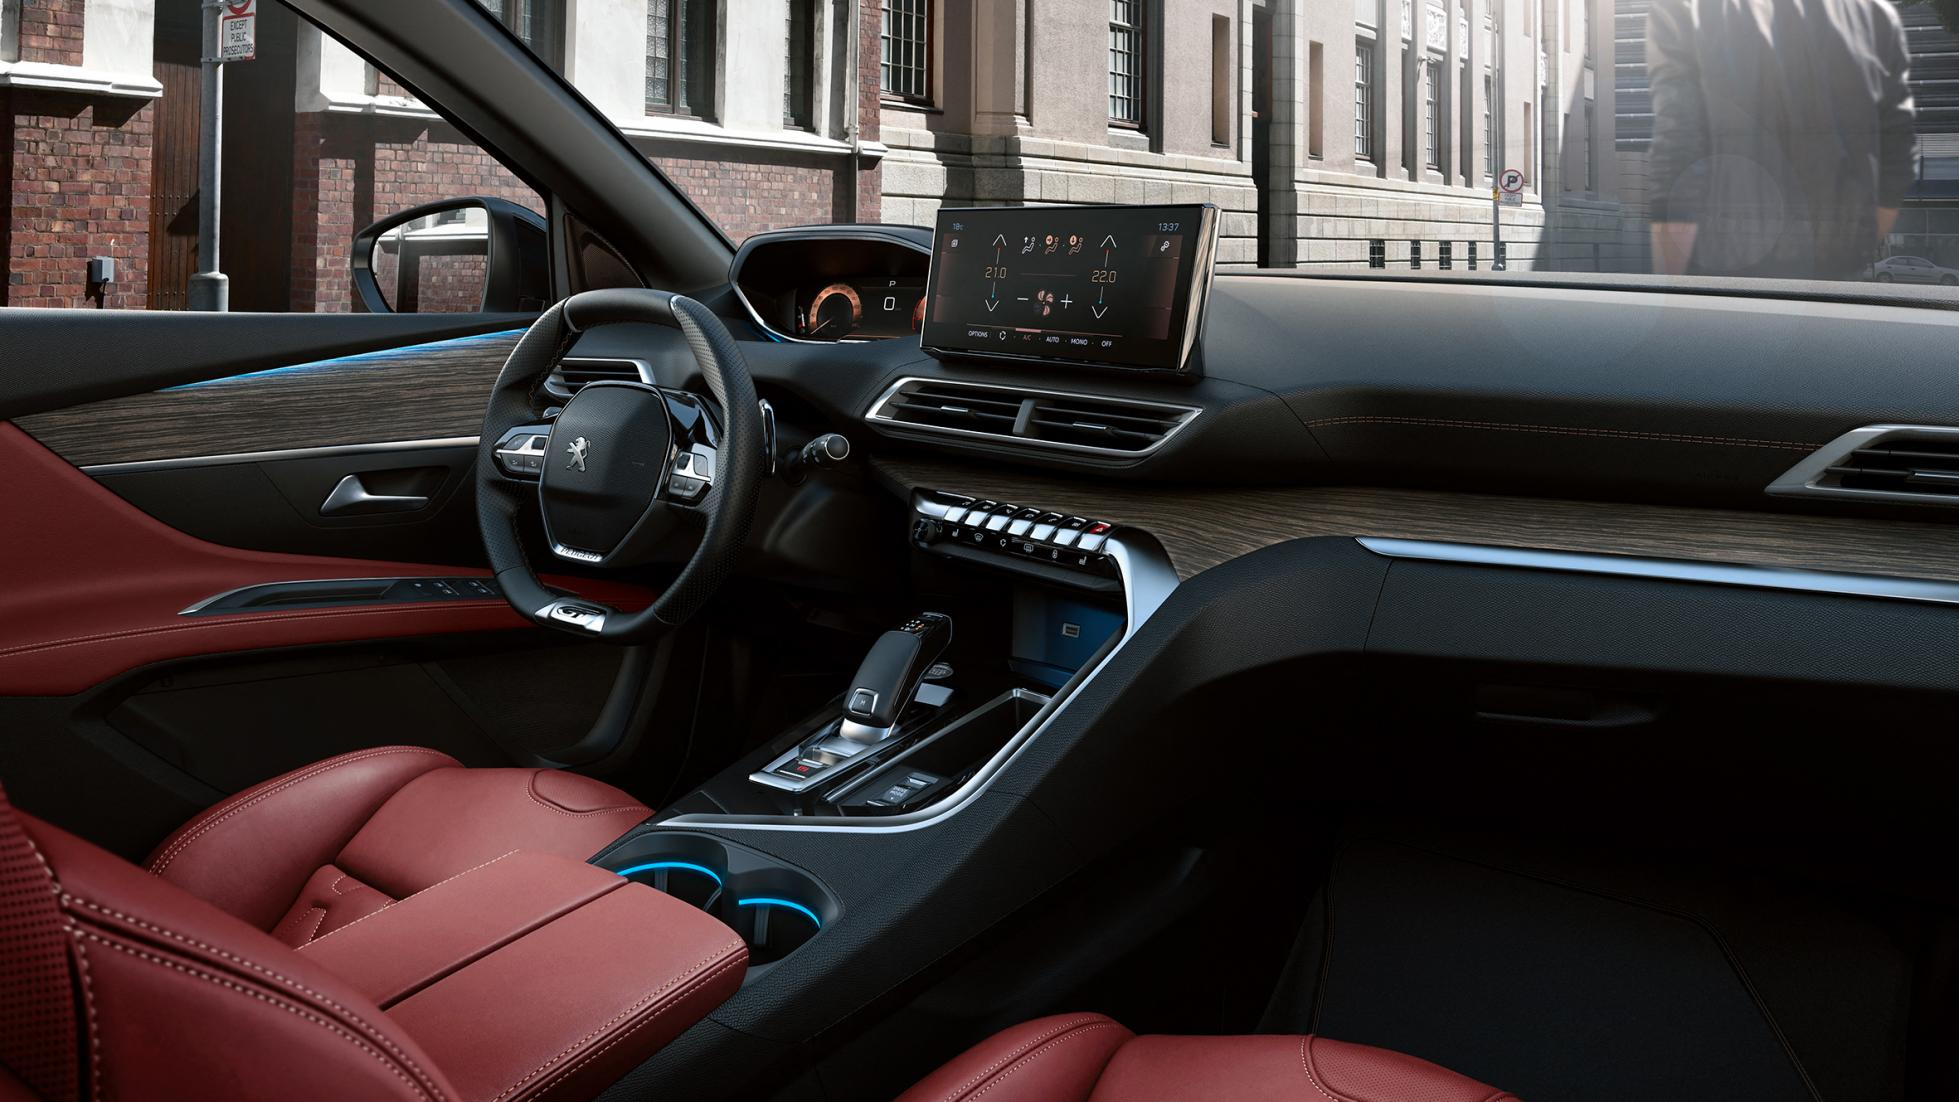 2021 Peugeot 3008 iç mekan